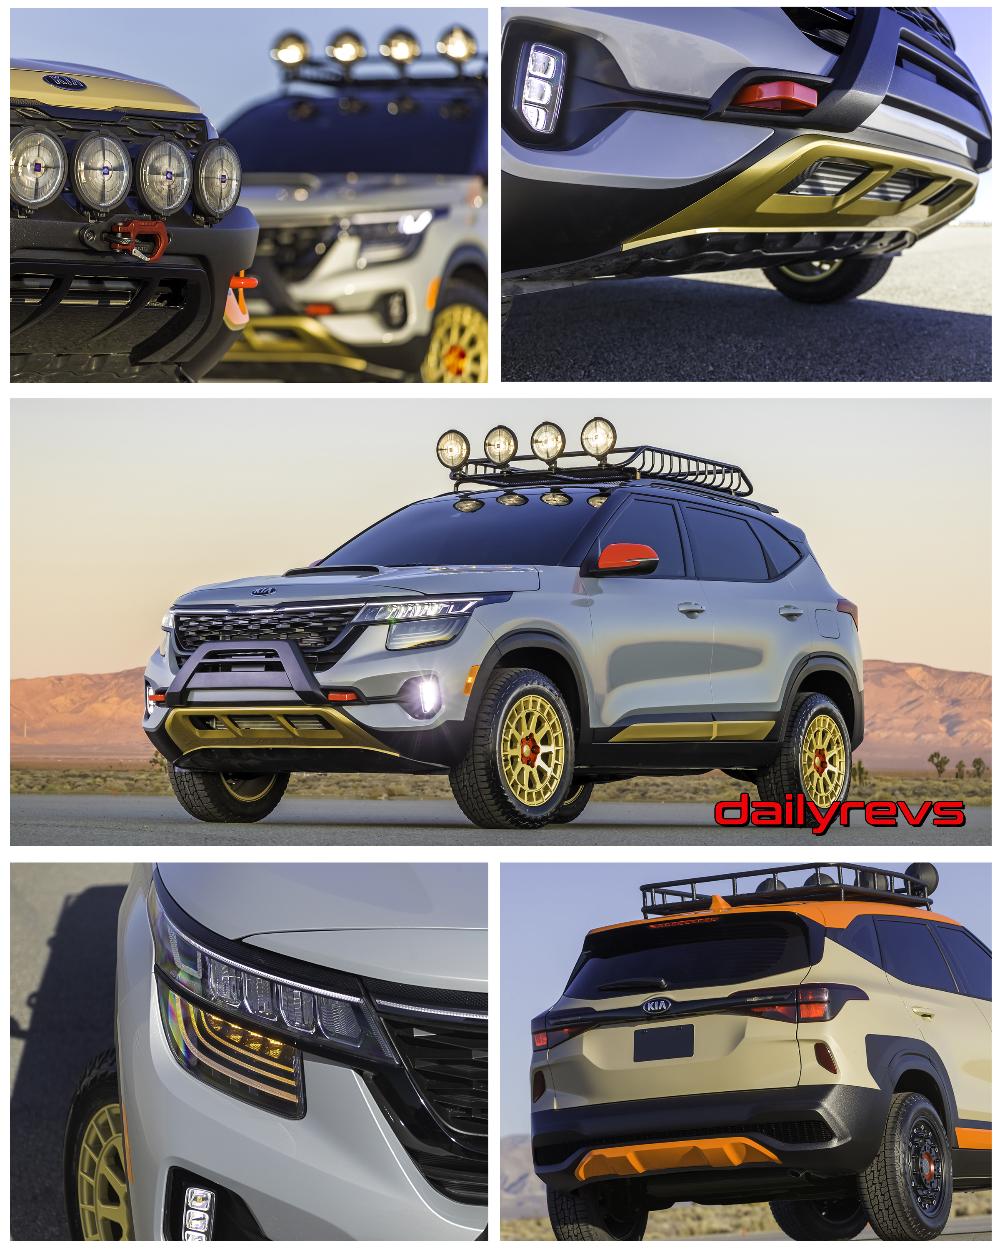 2019 Kia Seltos XLine Concept HD Pictures, Videos